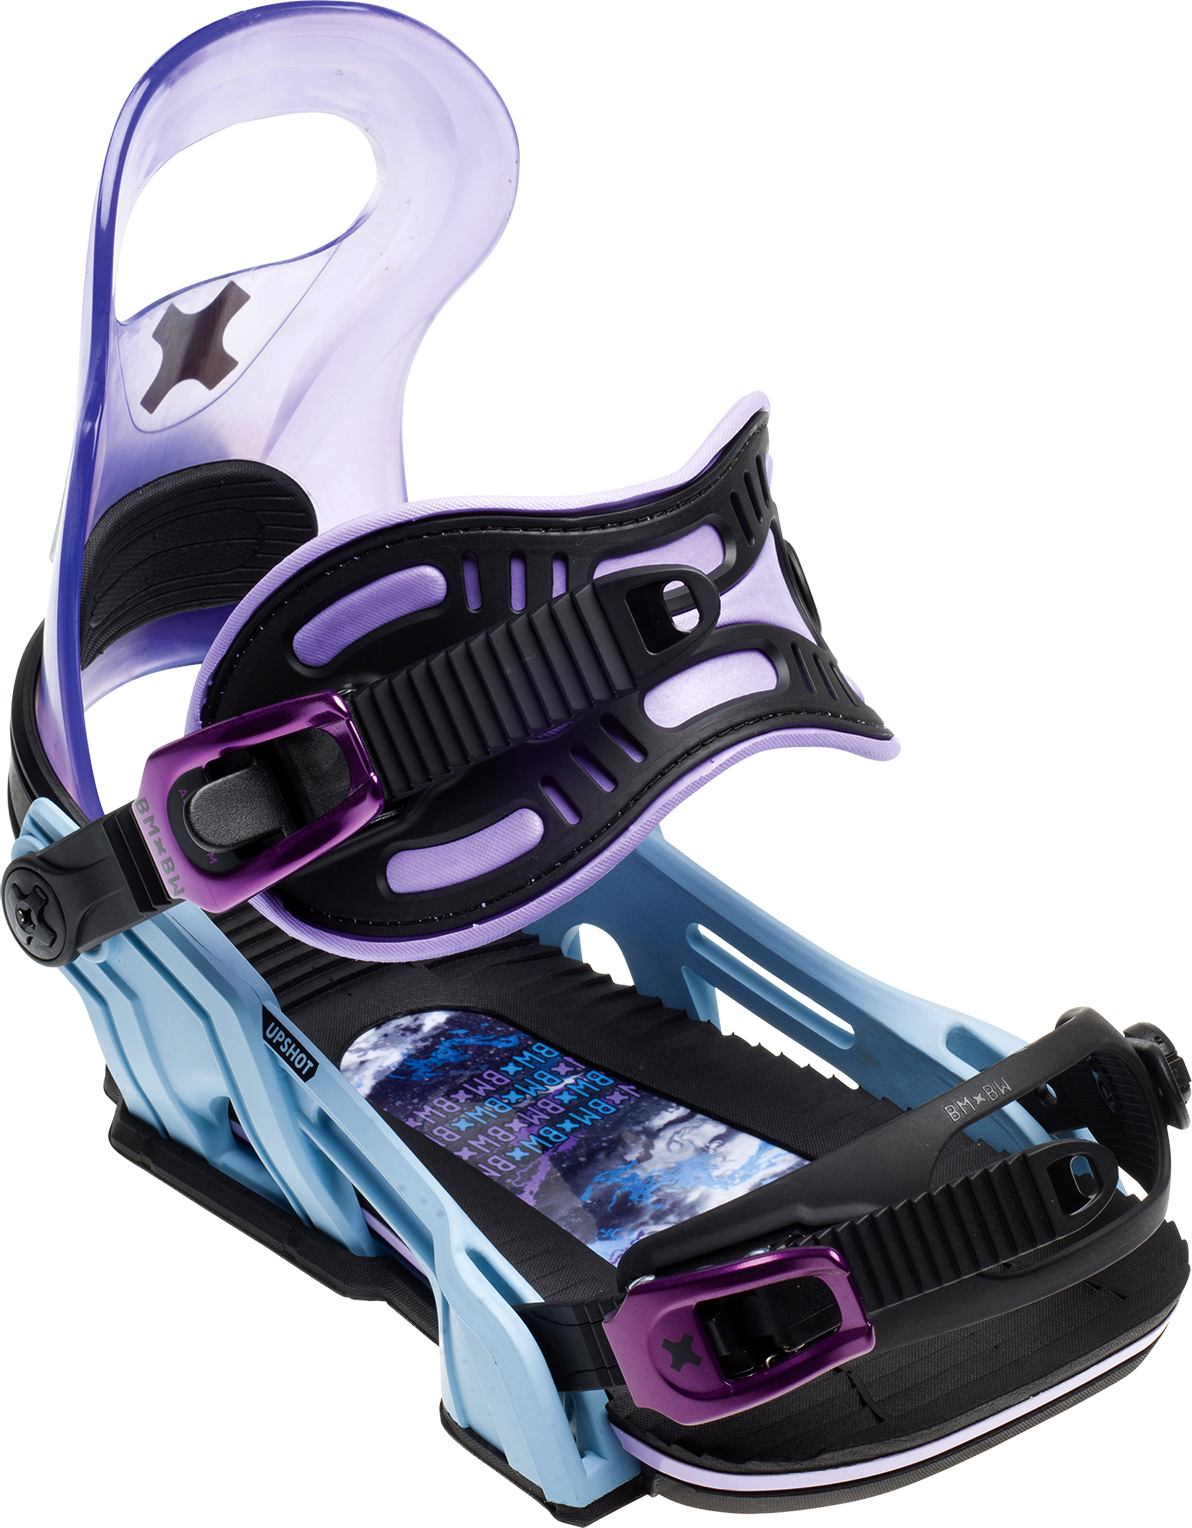 image bent-metal-upshot-purple-jpg